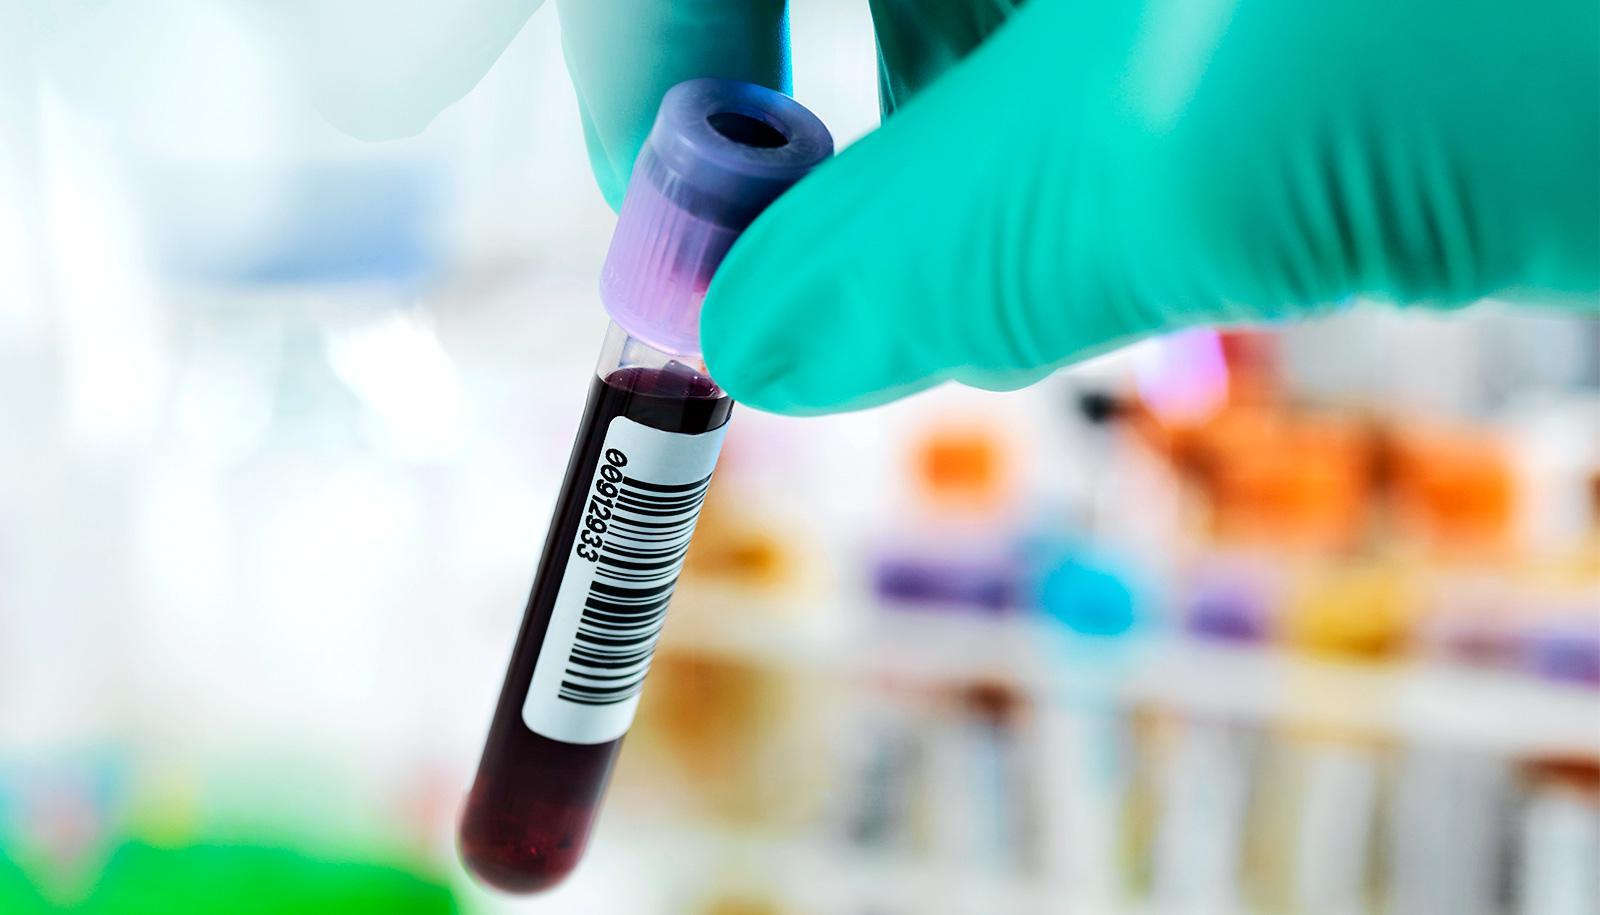 A health worker wearing green gloves picks up a blood test vial